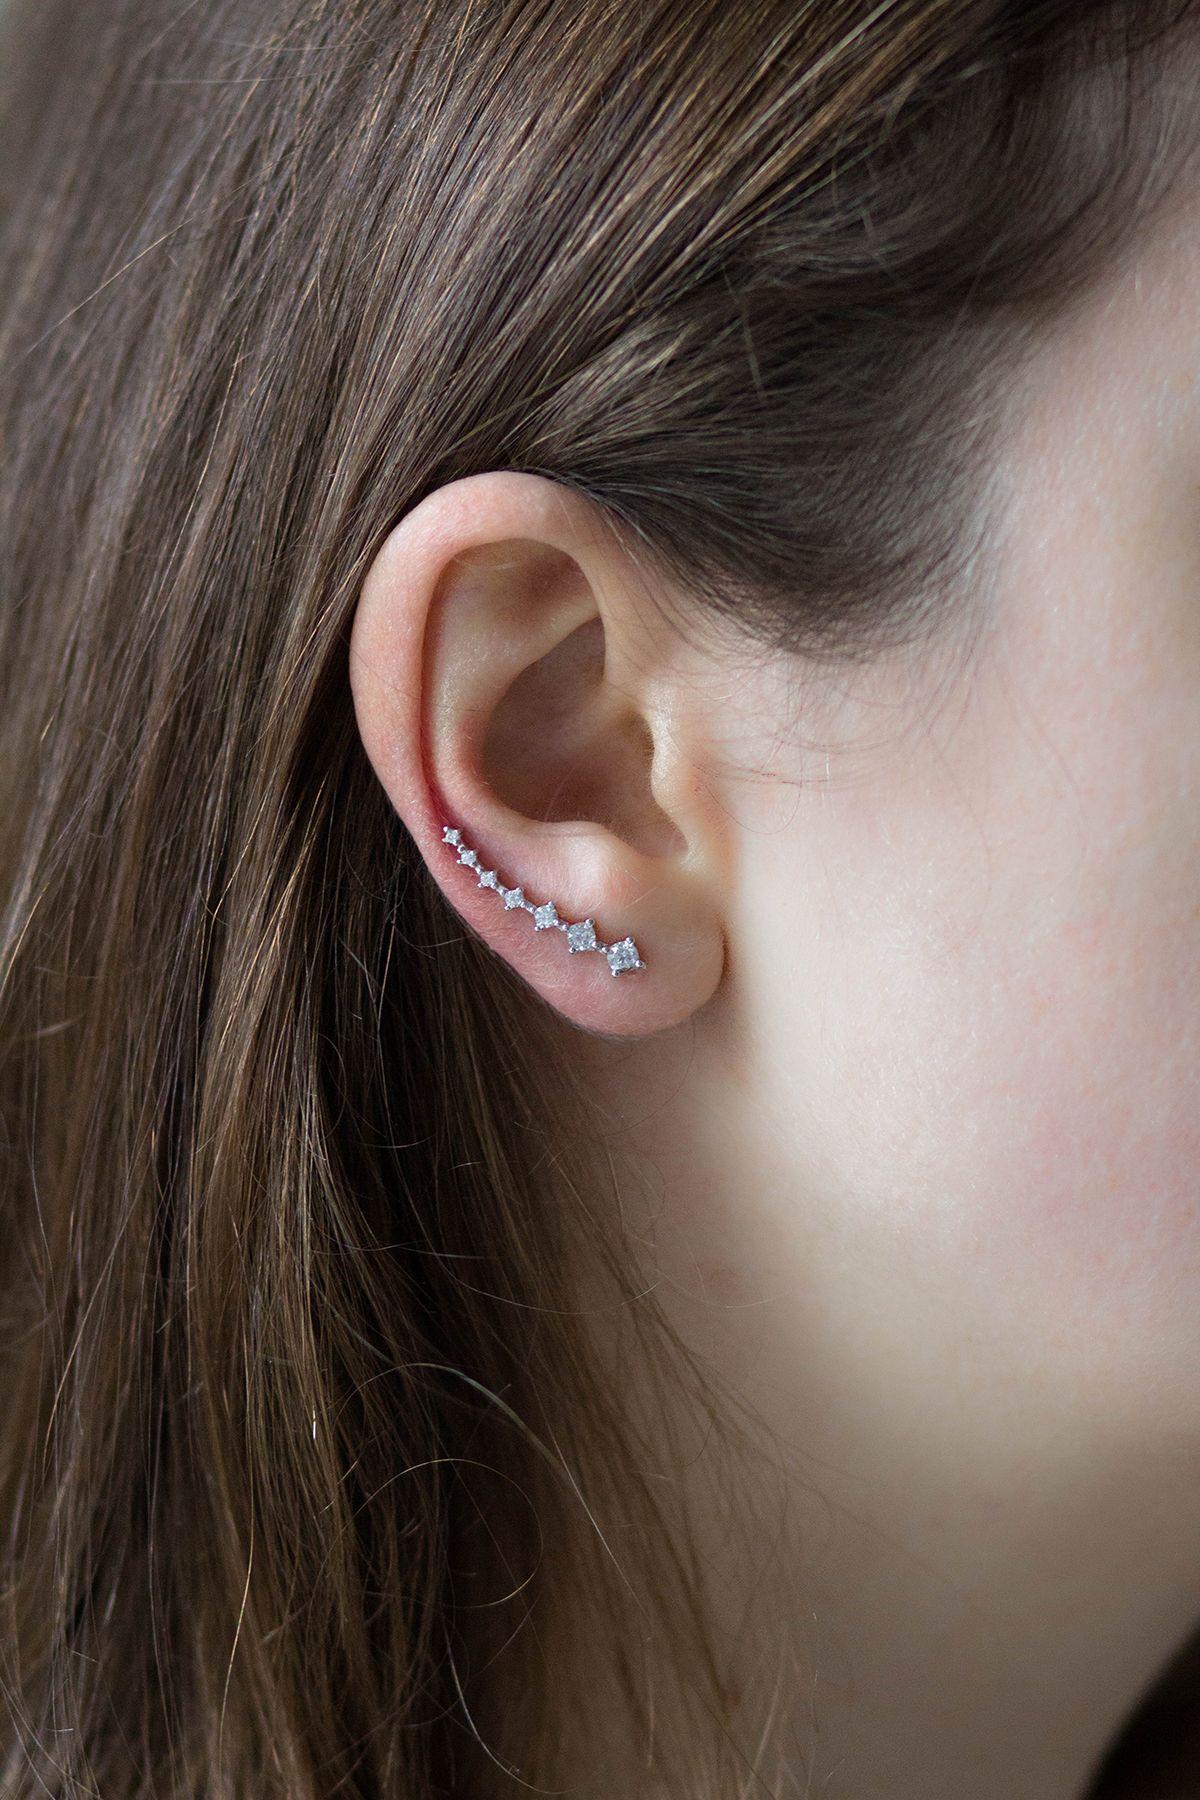 Silver Ear Hook. A sterling silver ear pin with clear Zircon stones. This earring / ear pin can be worn on pierced ears as well as on non-pierced ears.